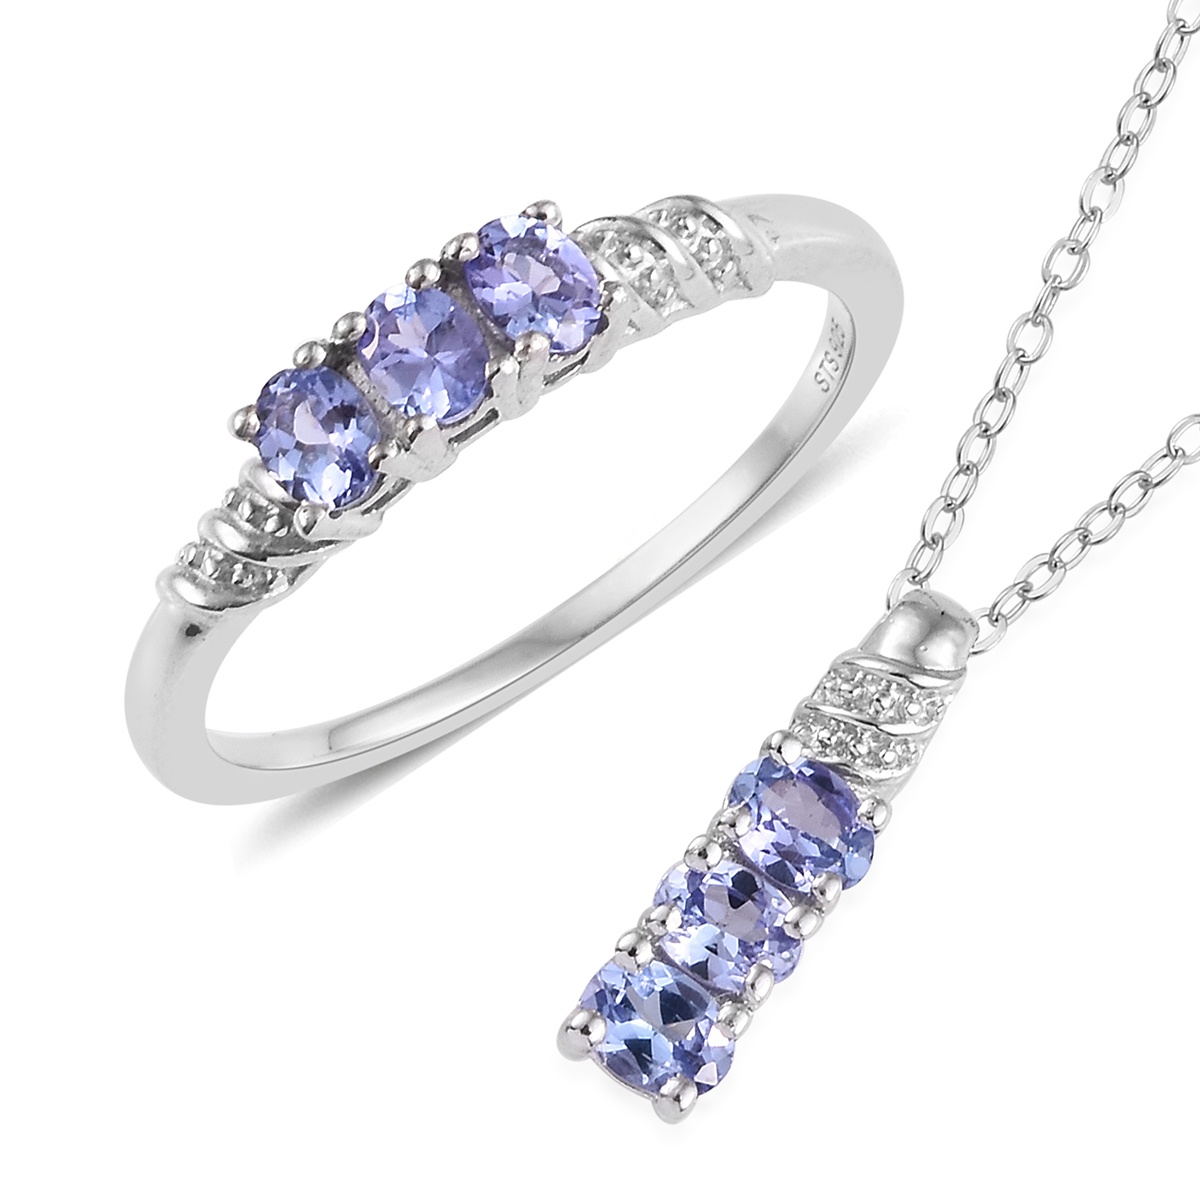 ONE A DAY 925 Silver Jewelry Aircraft Airplane Plane Chain Bracelet Adjustable Charm for Girls Woman DAYONE JEWELRY LTD MADYB0515